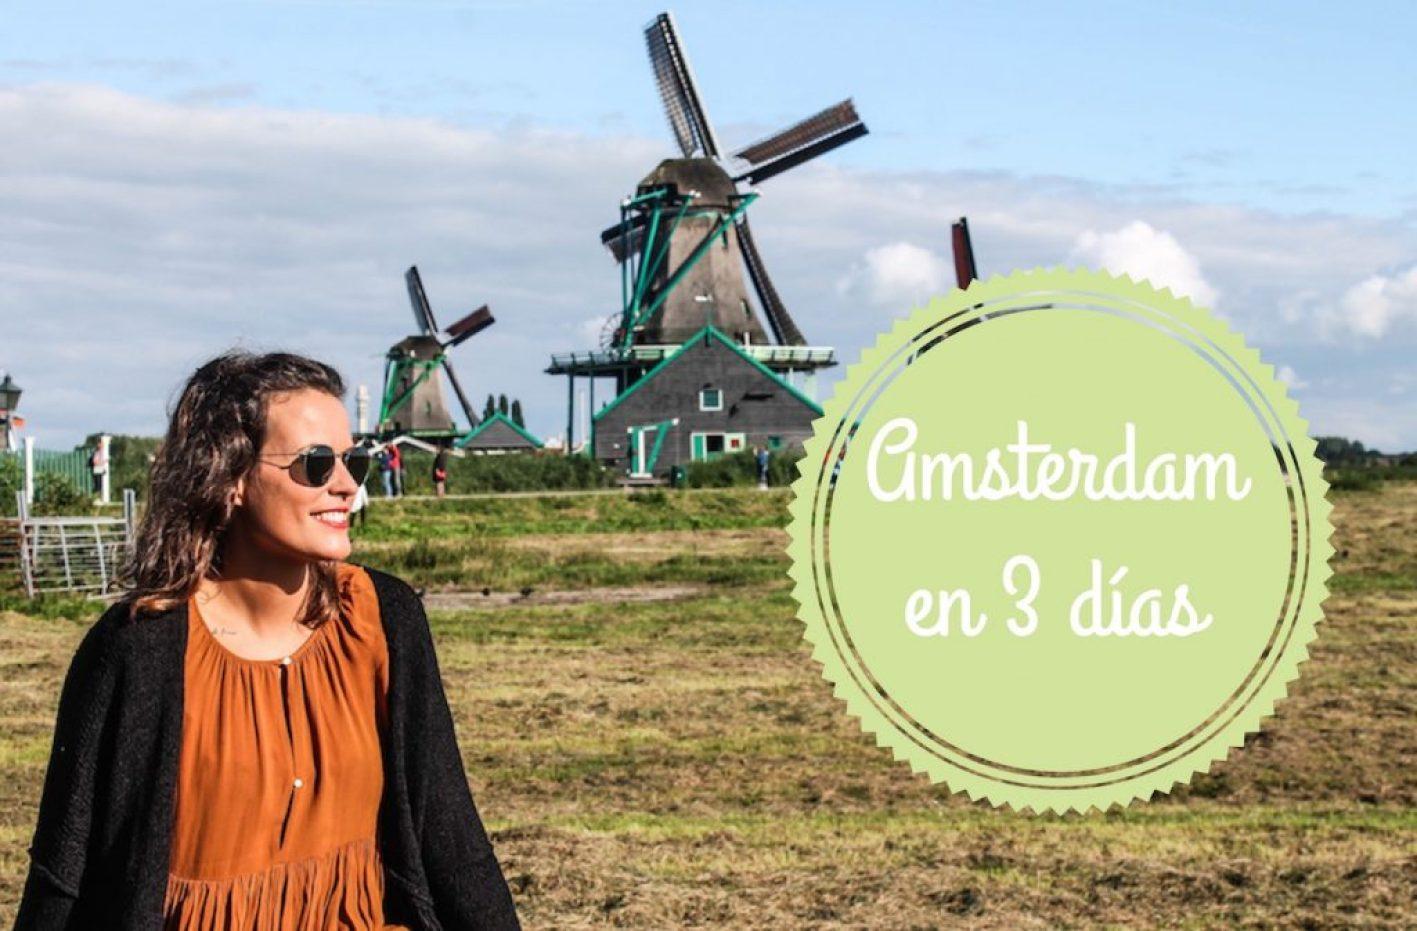 Amsterdam en 3 días